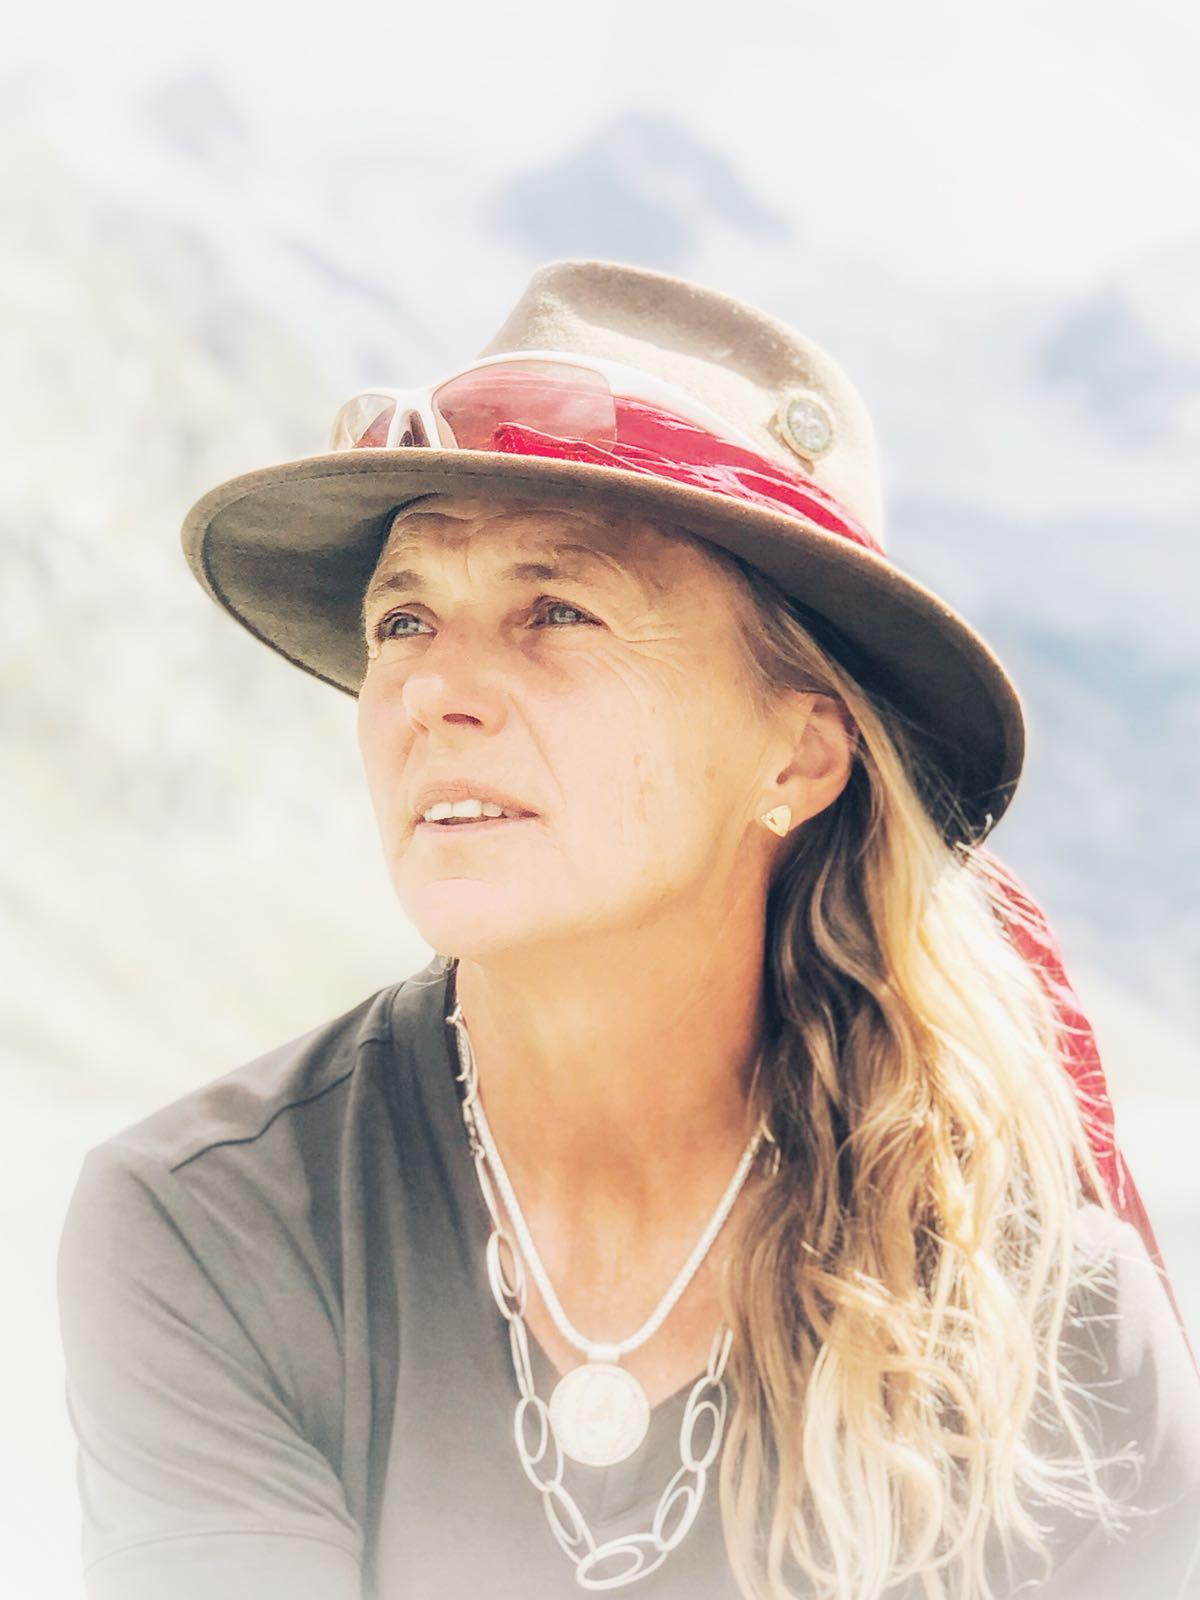 Tina Boche